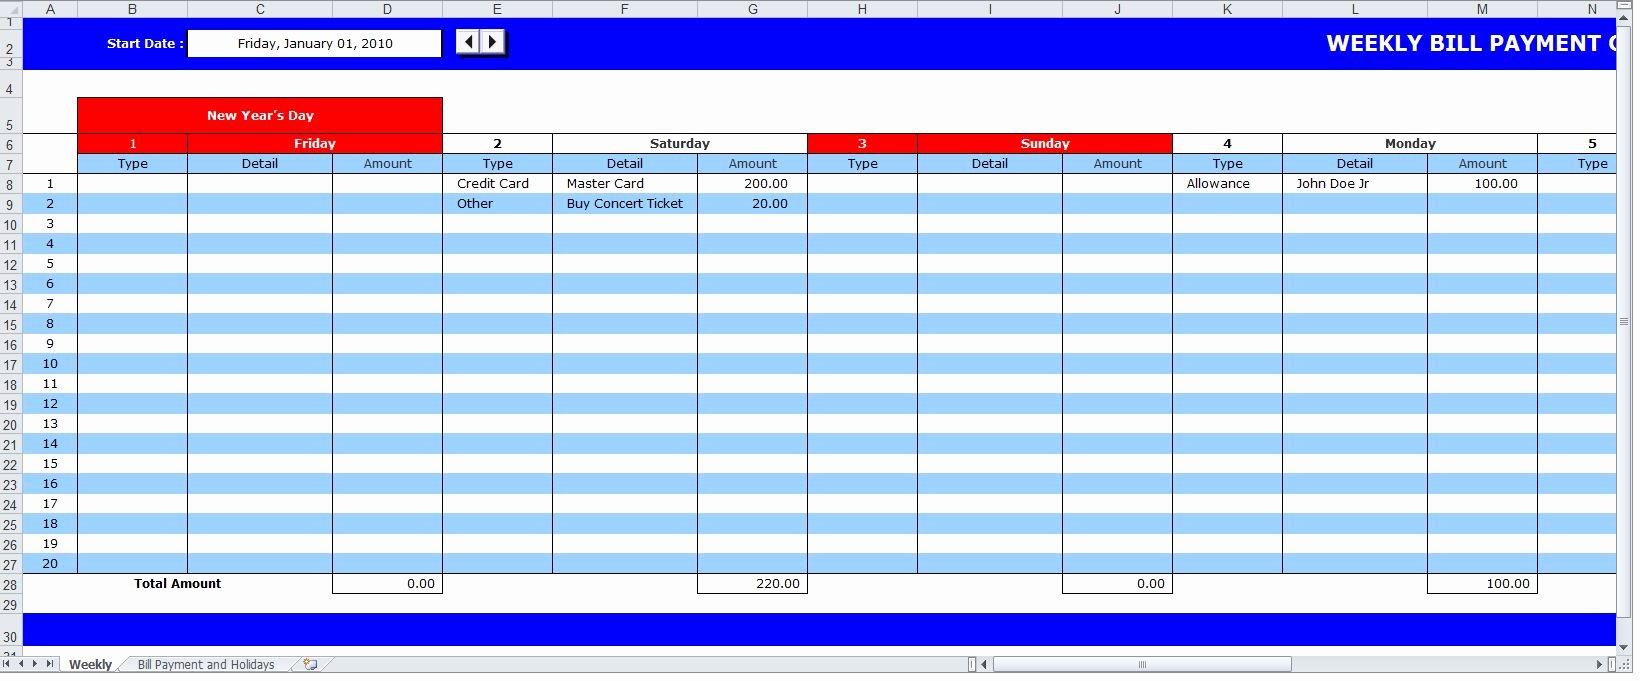 Bill Payment Schedule Template Luxury Bill Payment Schedule